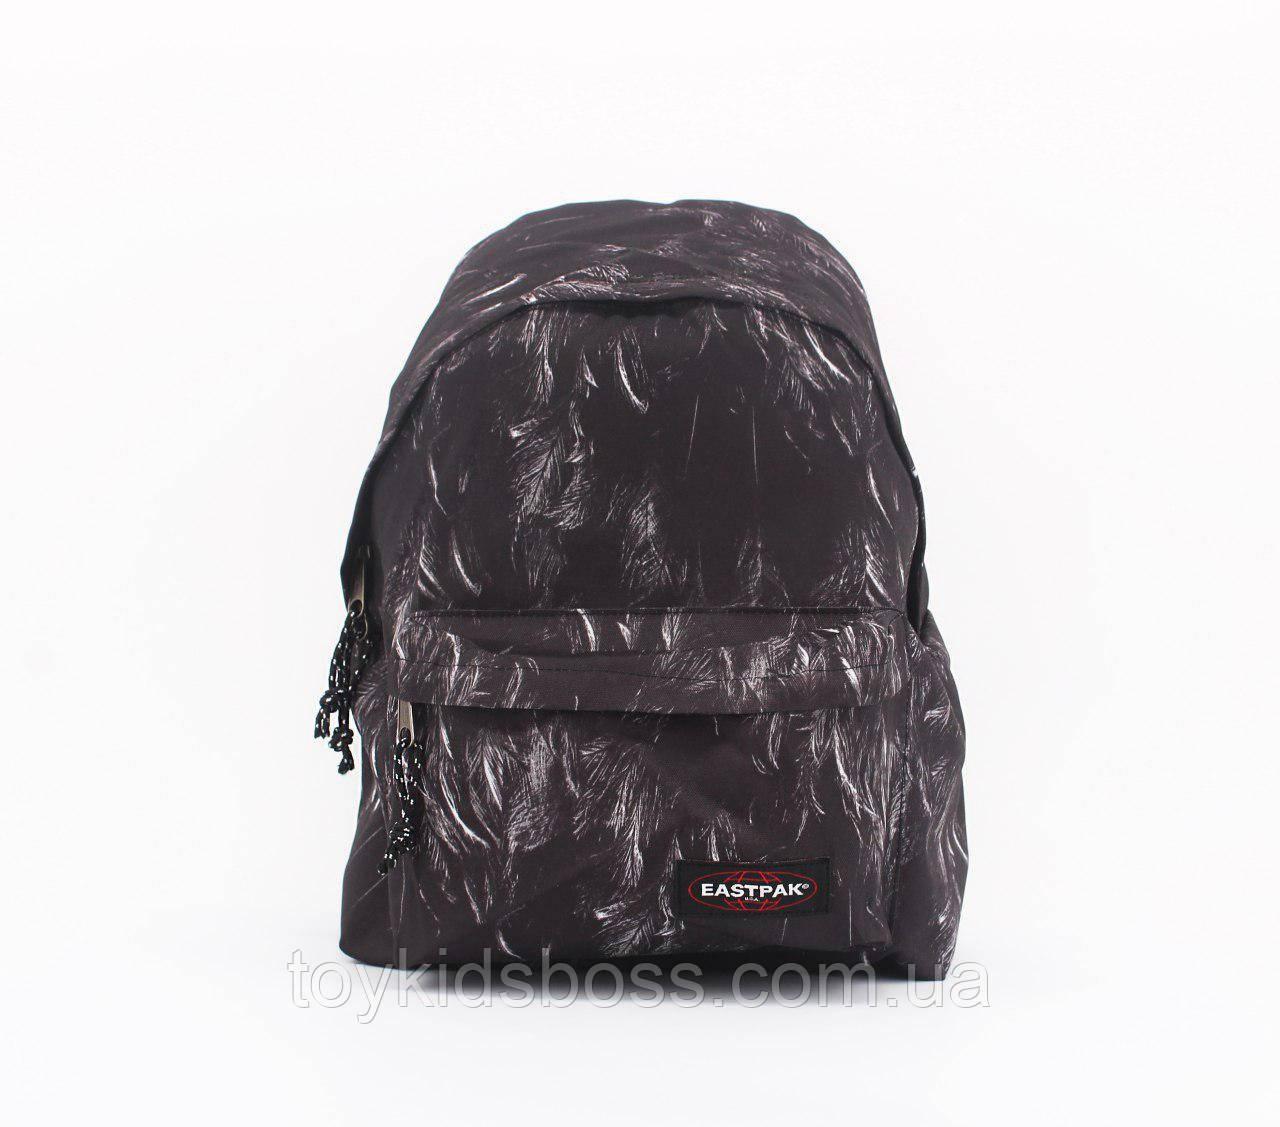 Рюкзак EASTPAK Grey black